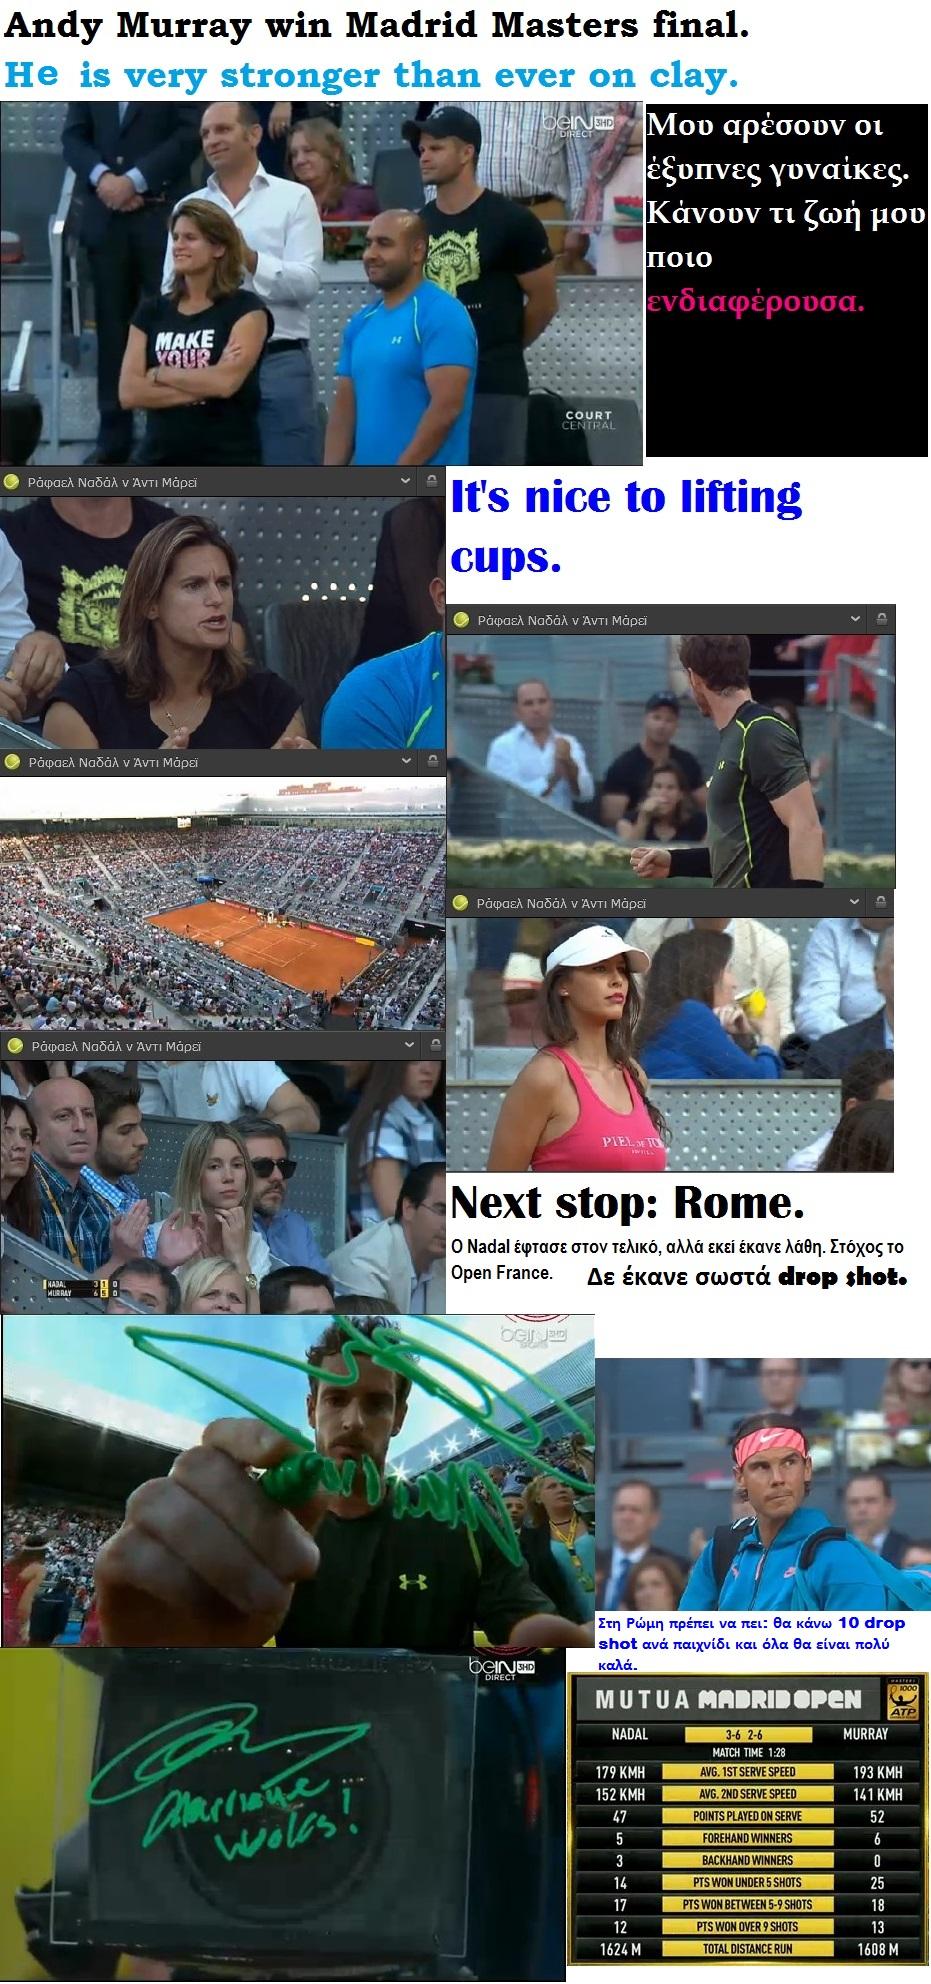 TENNIS ATP CLAY MADRID MASTERS NADAL VS MURRAY WIN 01 110515